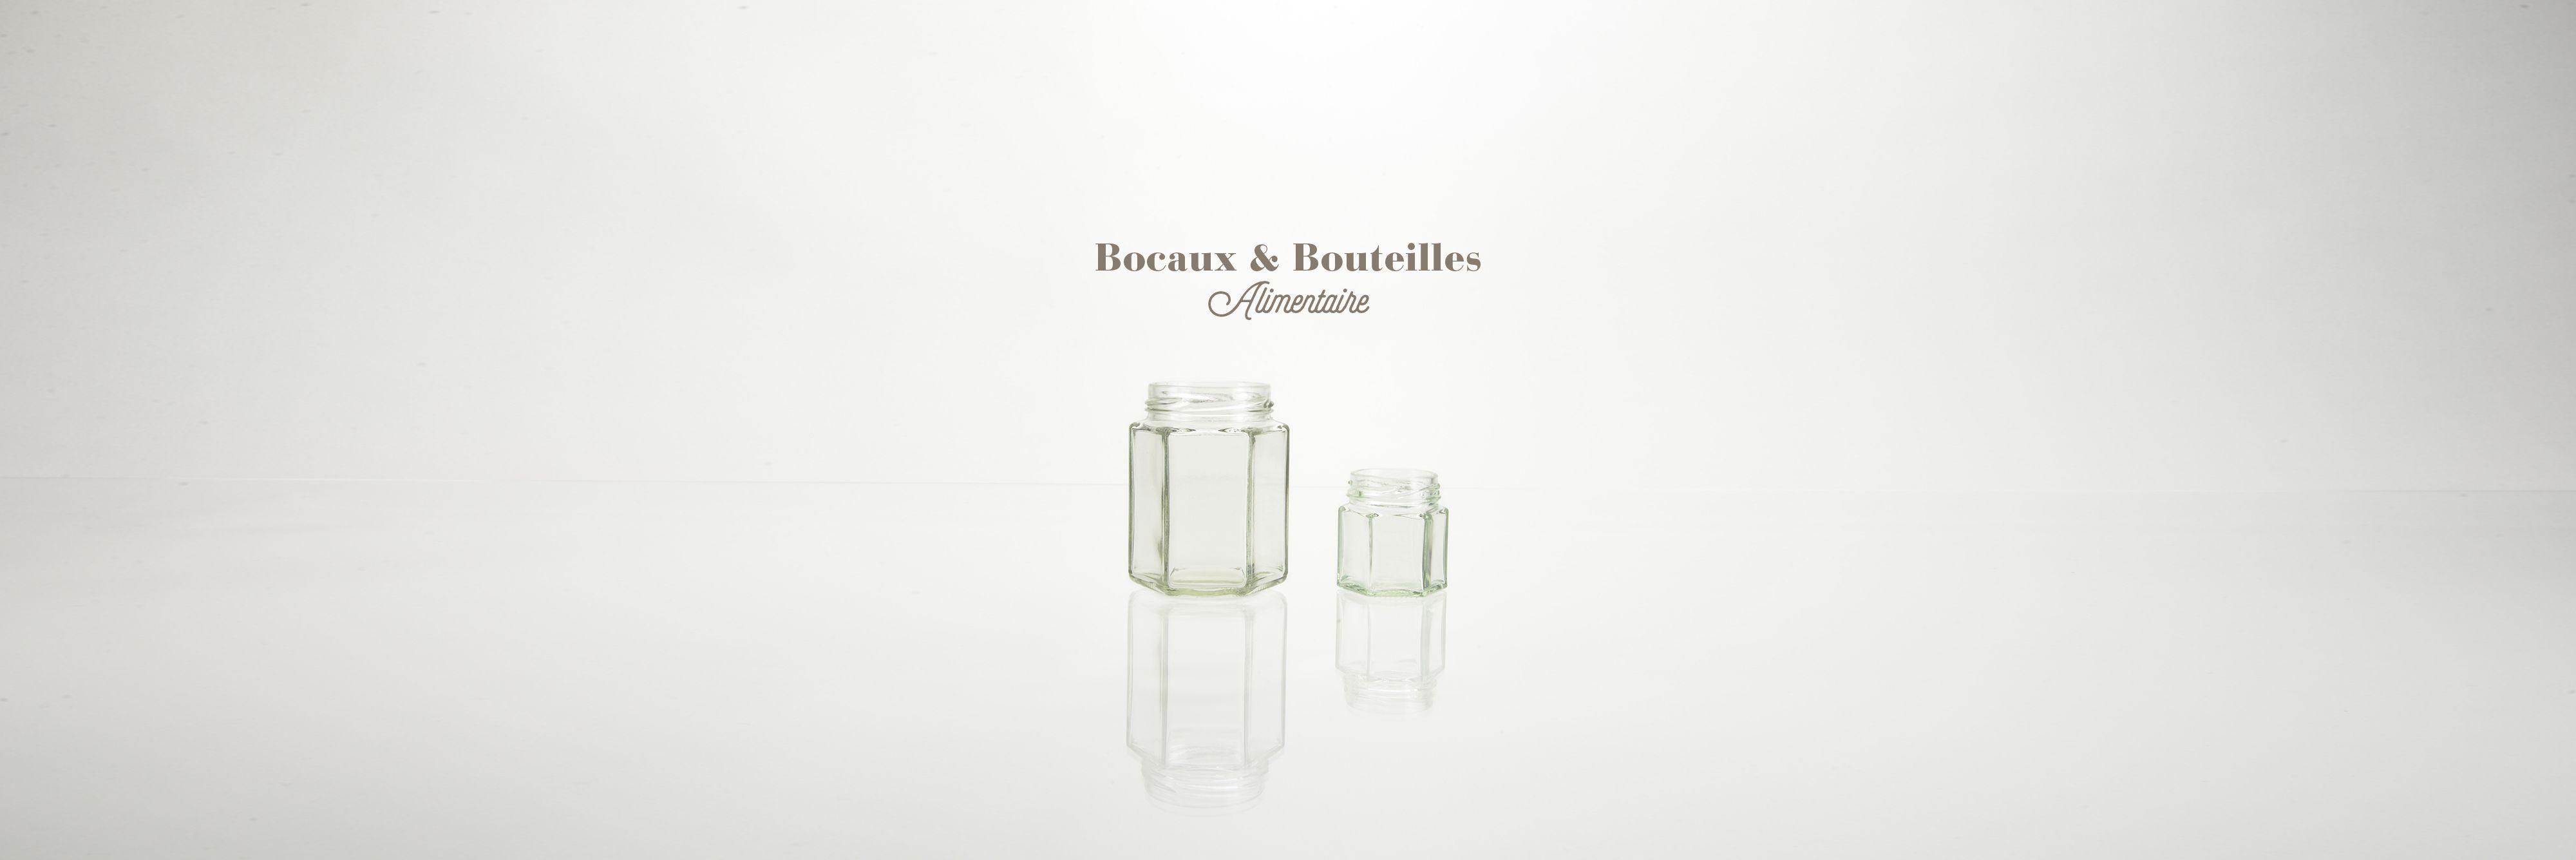 bocaux-slide